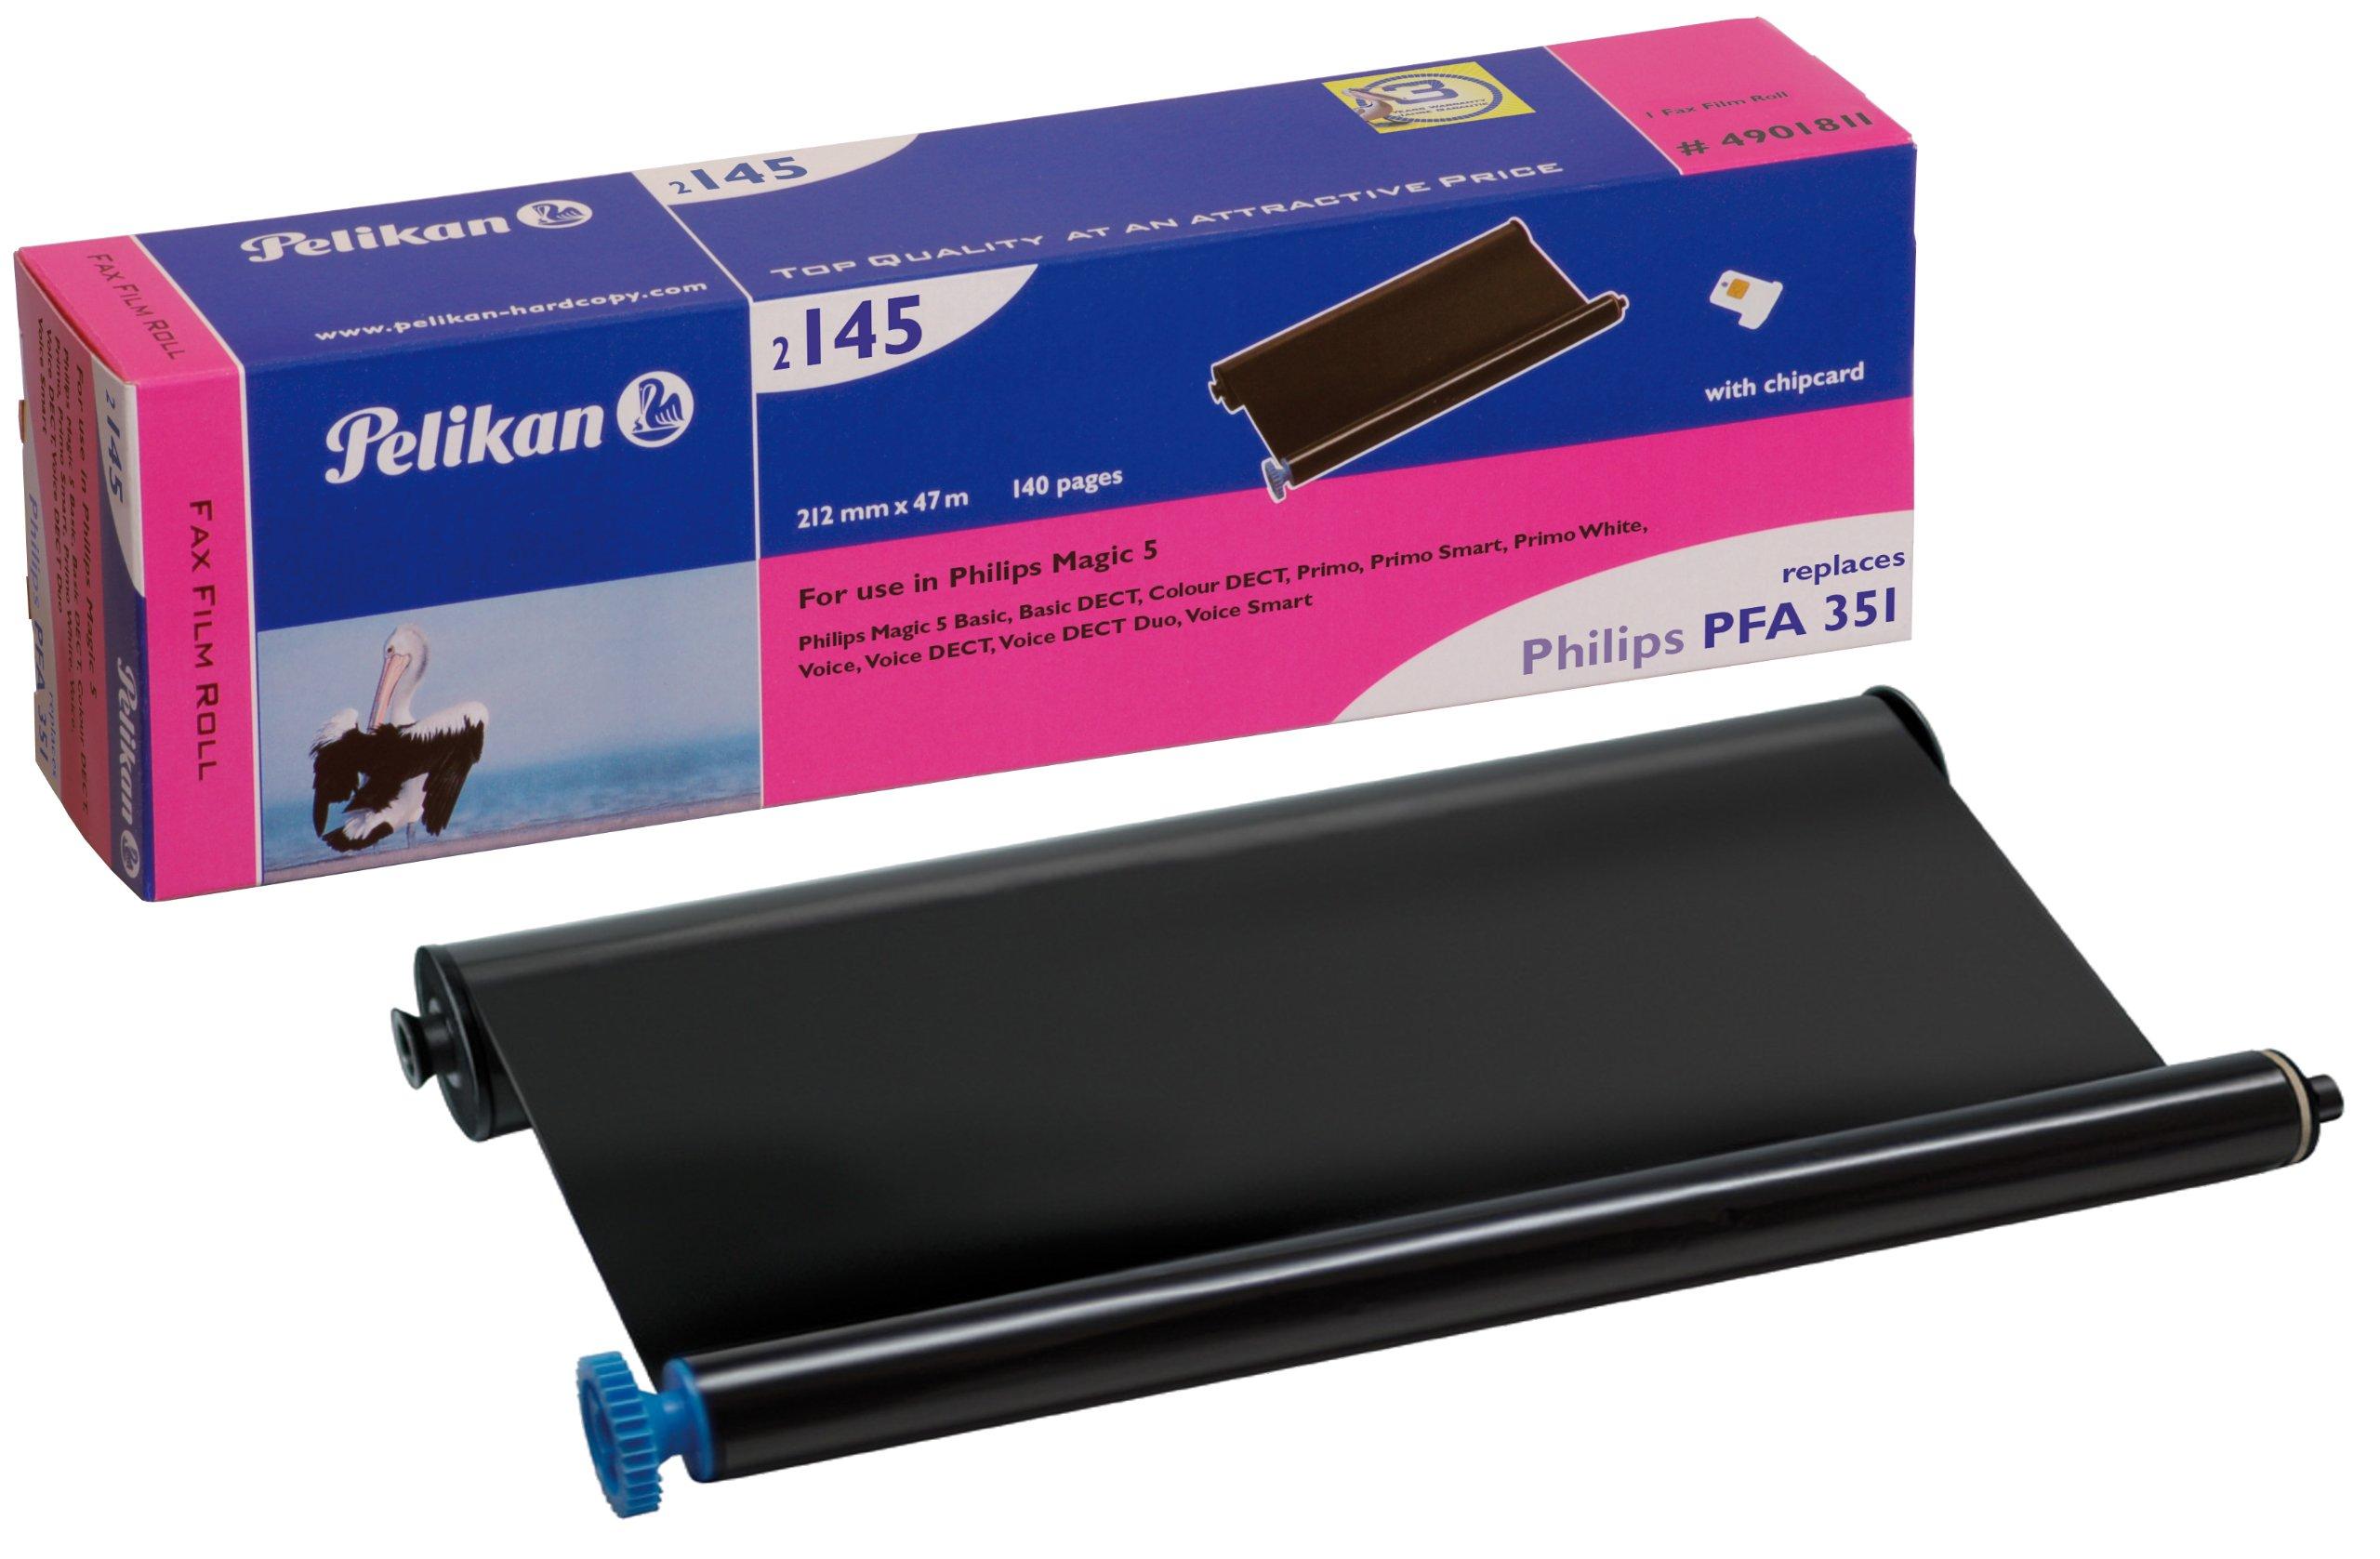 Pelikan-2145-Thermotransfer-Rolle-ersetzt-PFA-351-fr-Philips-Magic-5-212-mm-x-47-m-schwarz